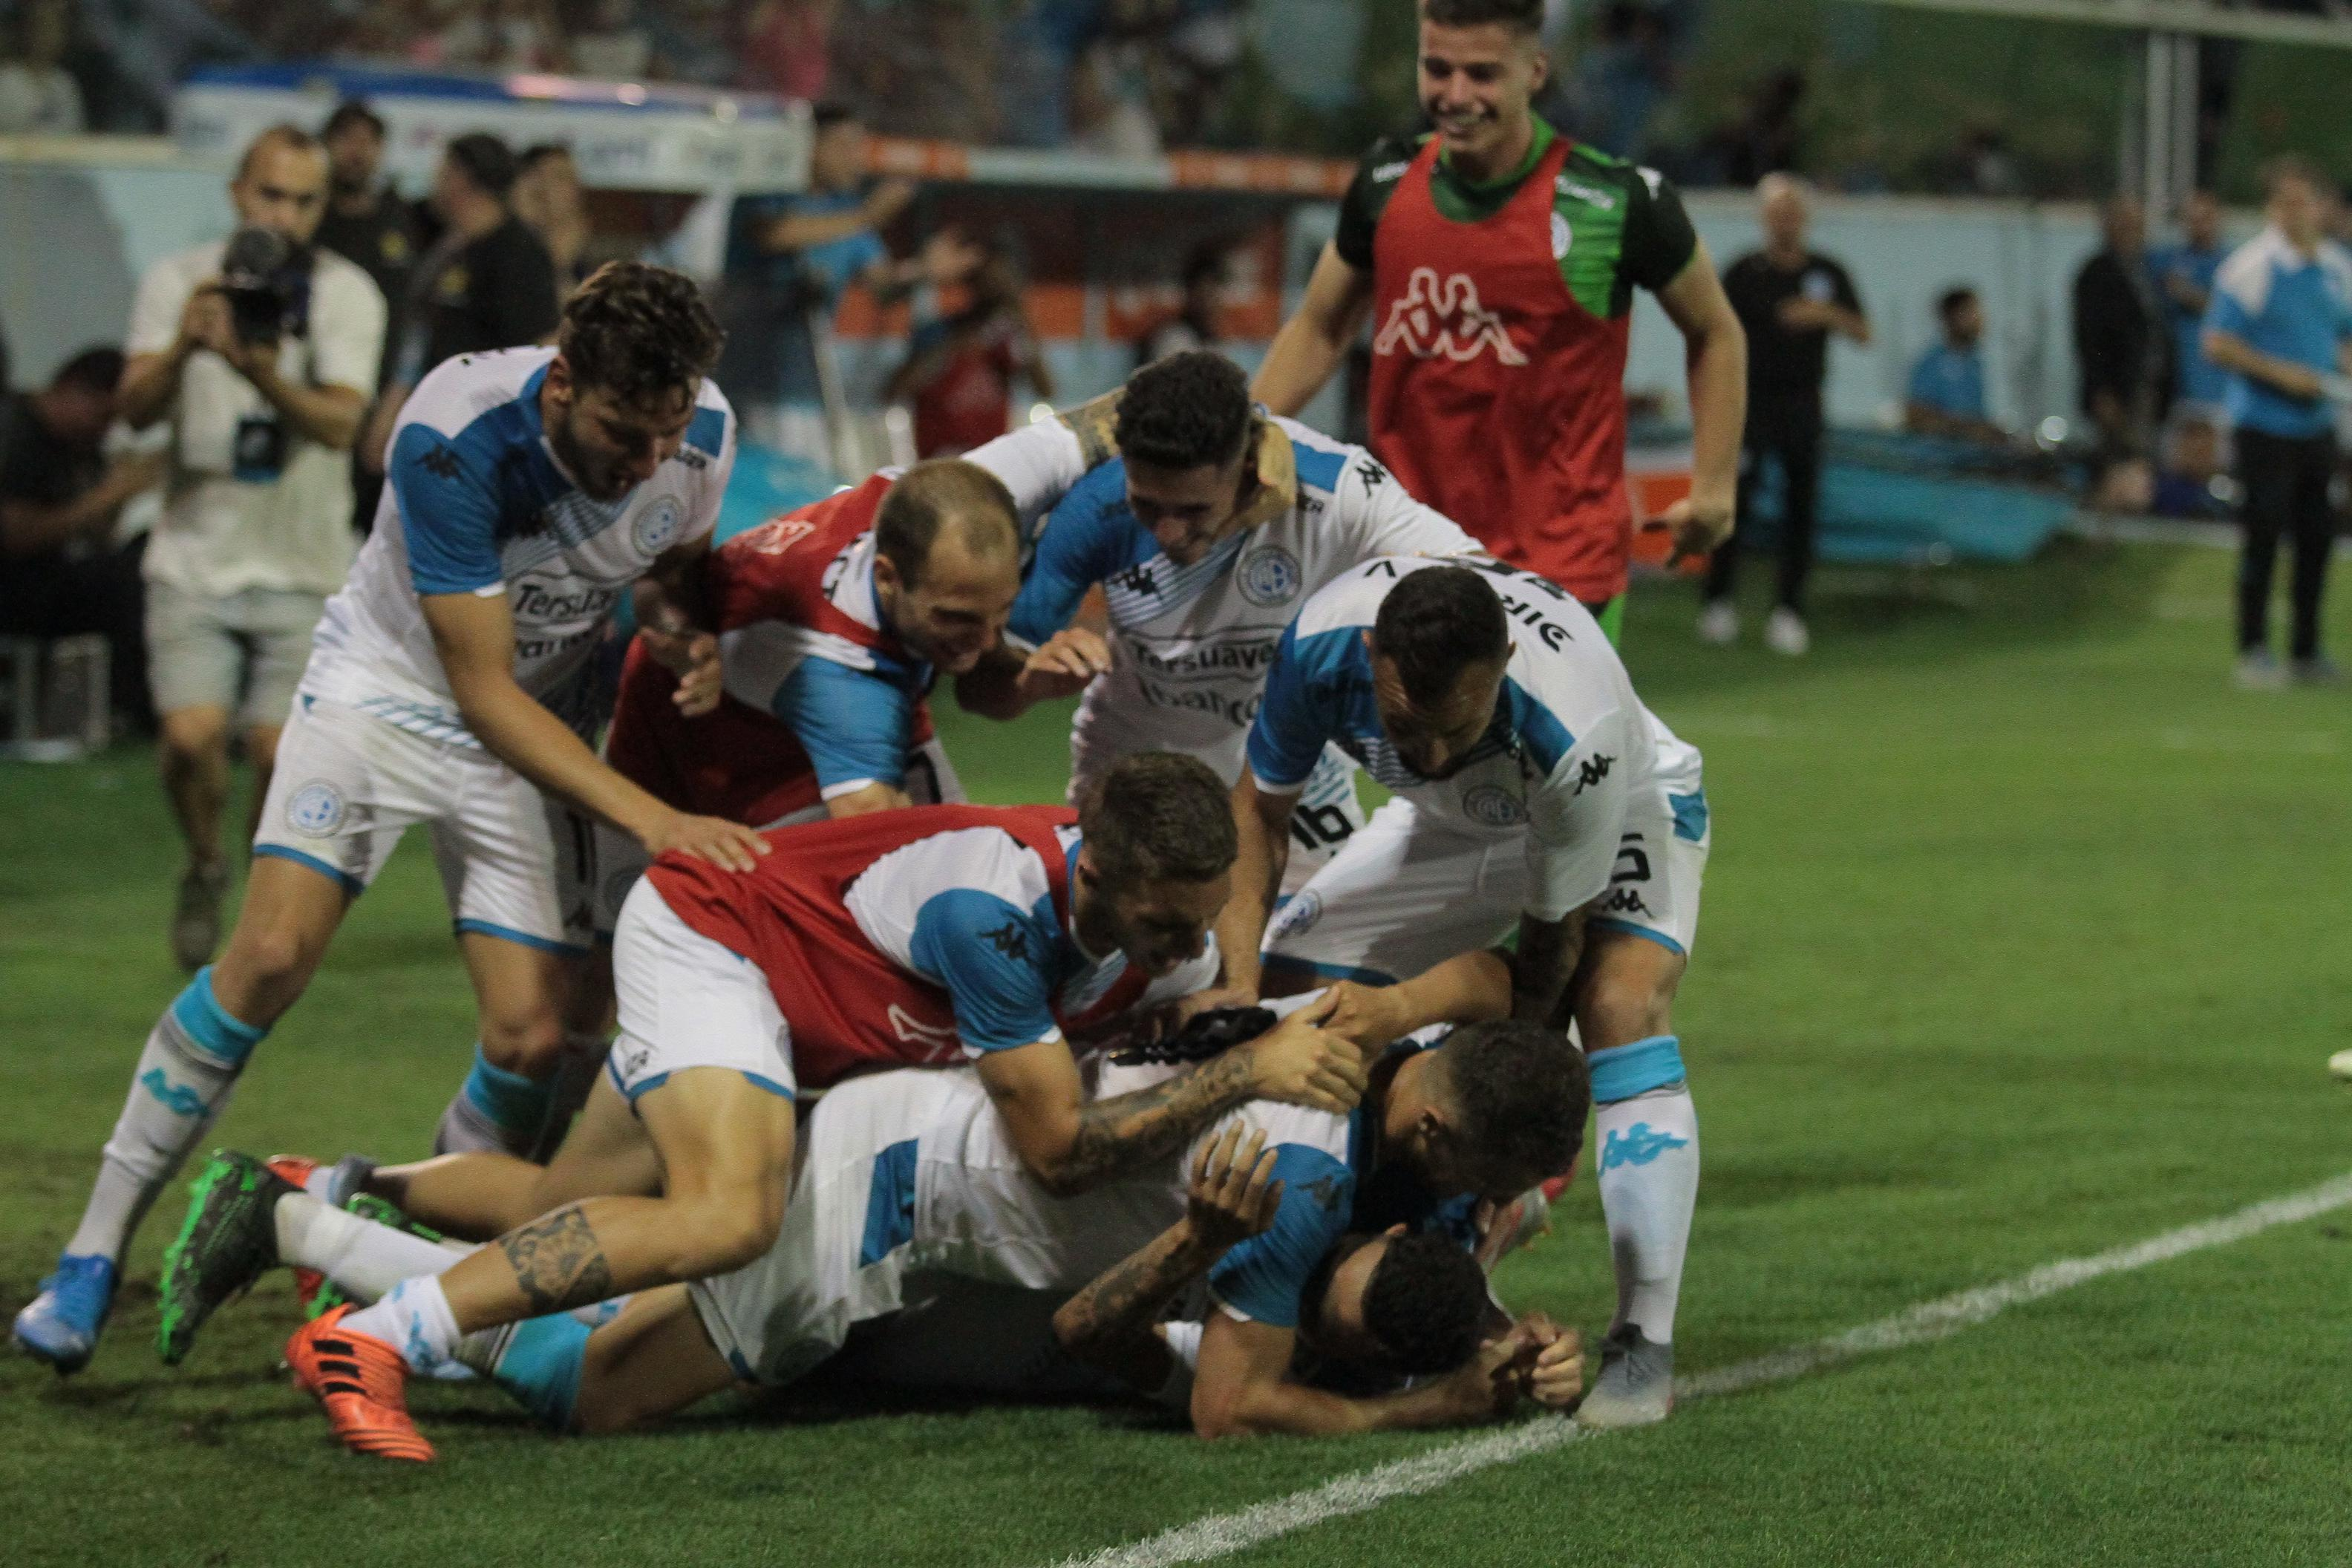 Belgrano no pudo mantener la ventaja y empató con Alvarado - Javier Imaz